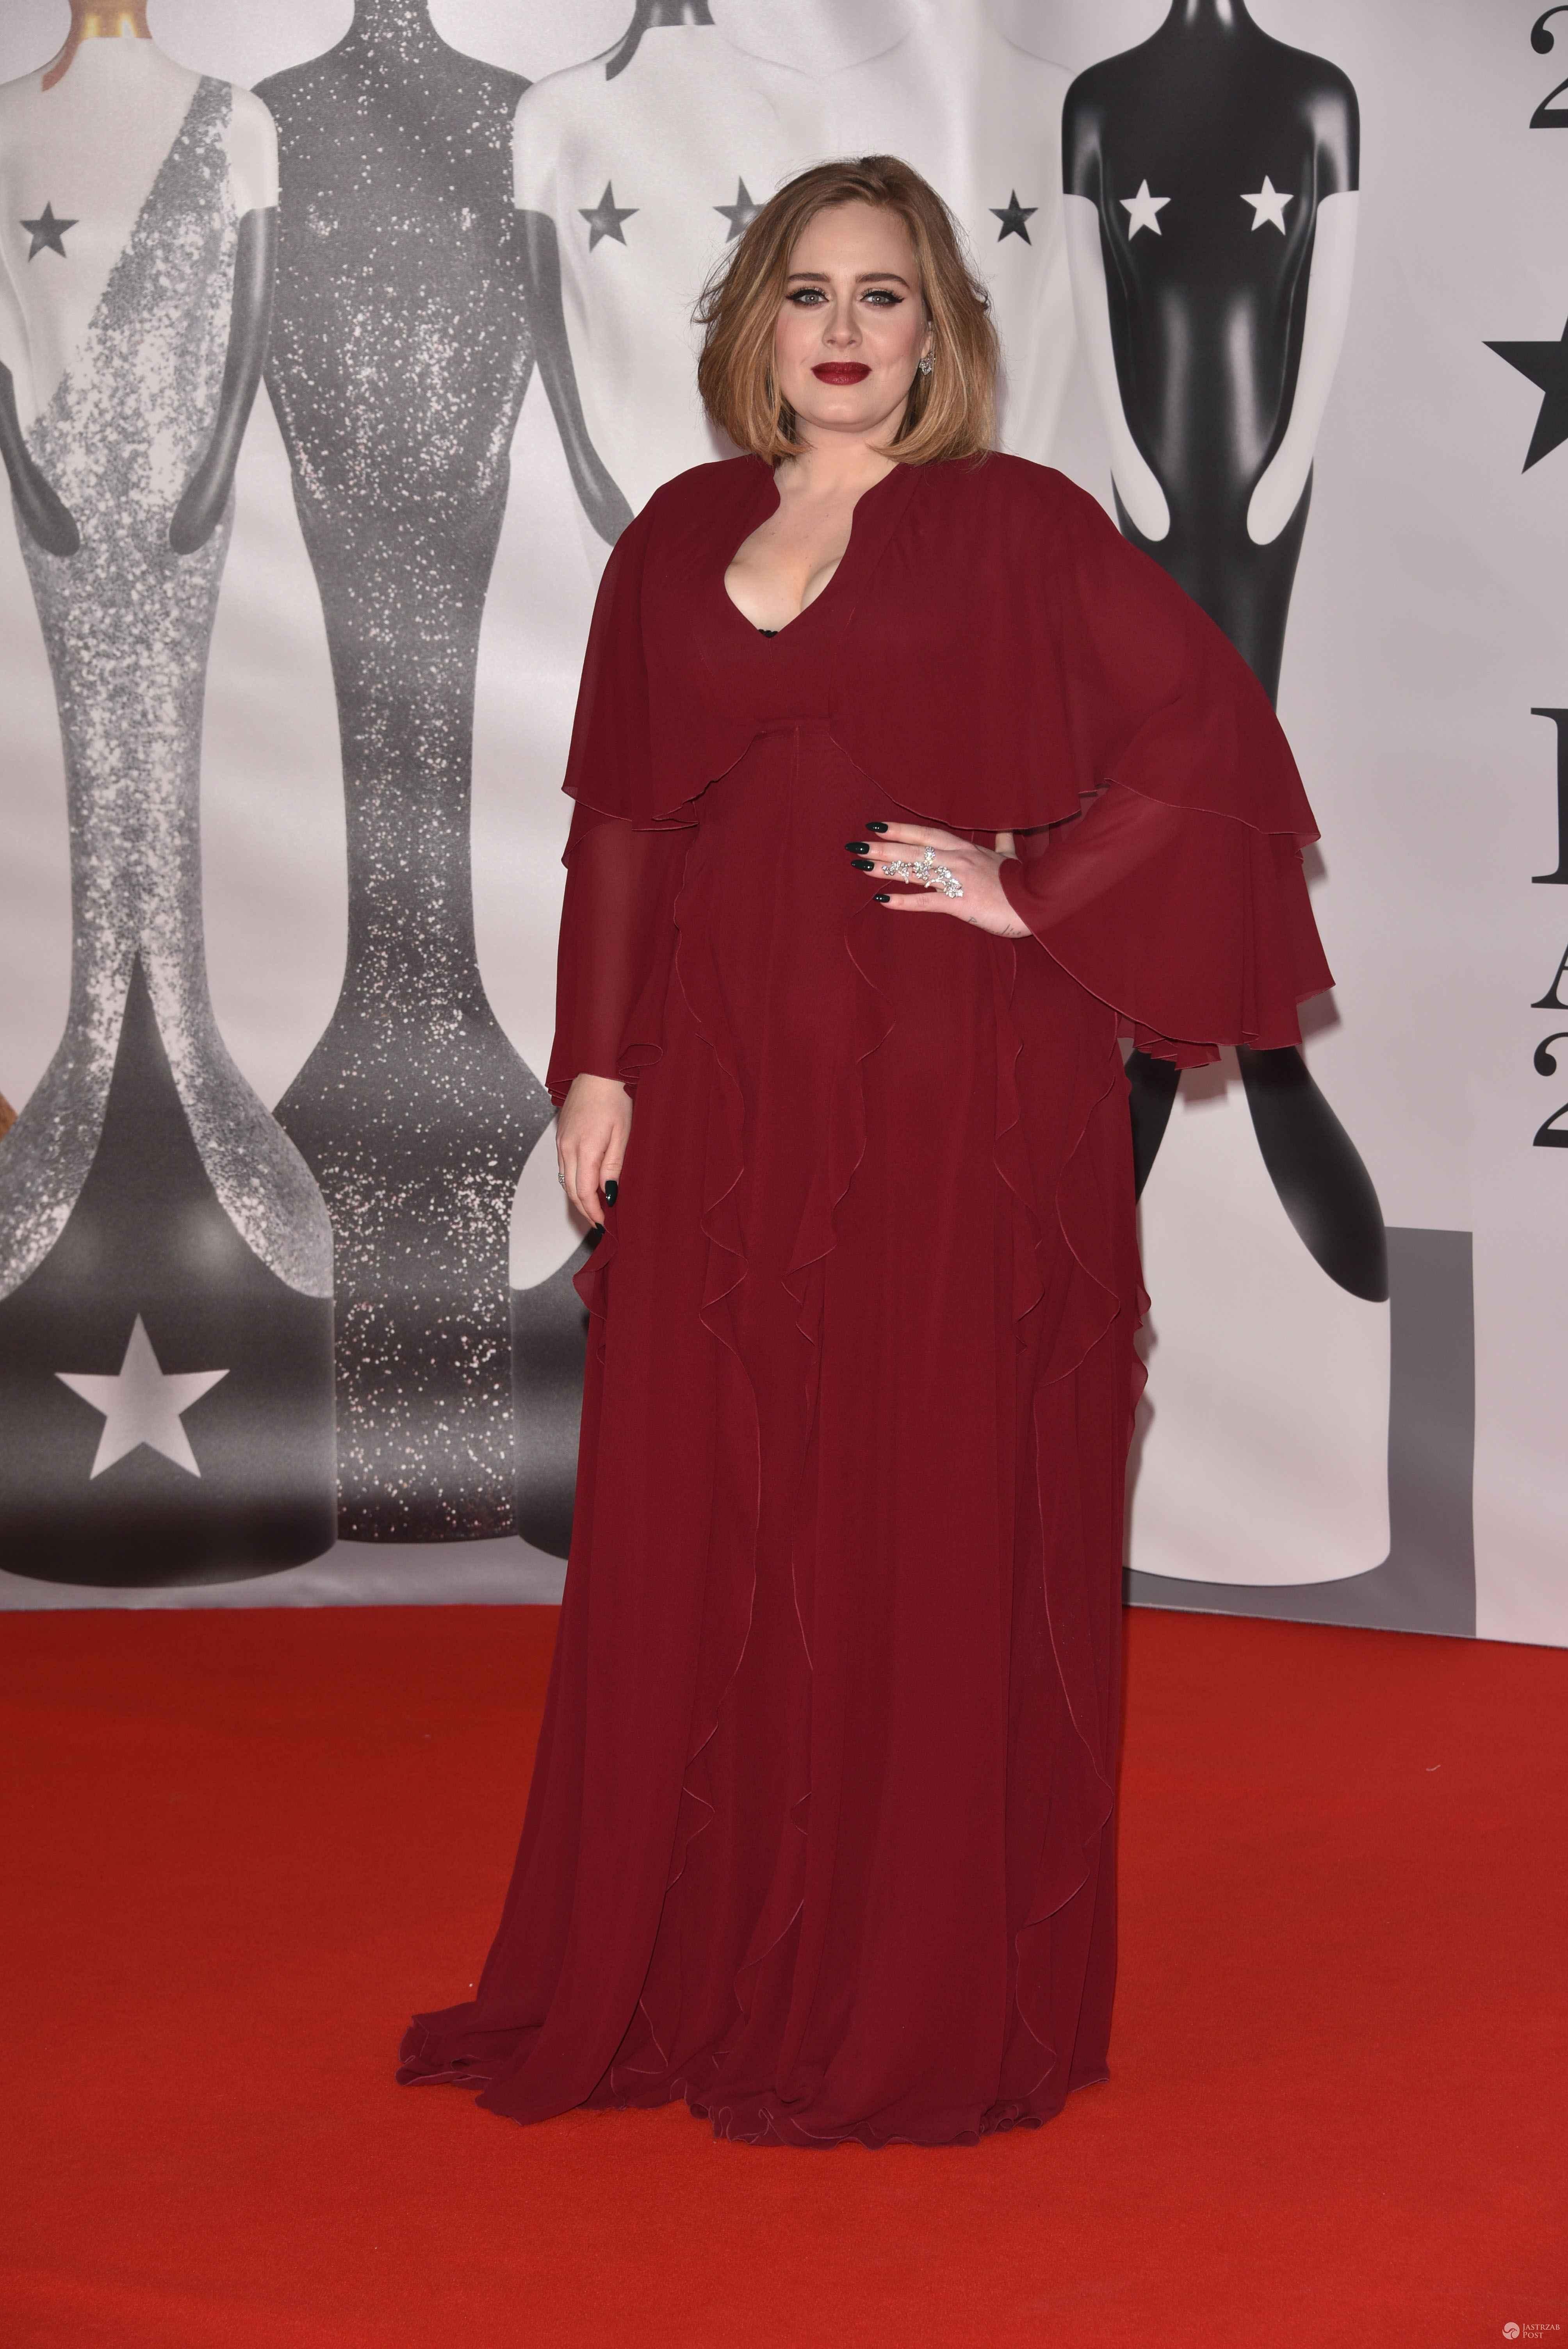 Jak schudła Adele?